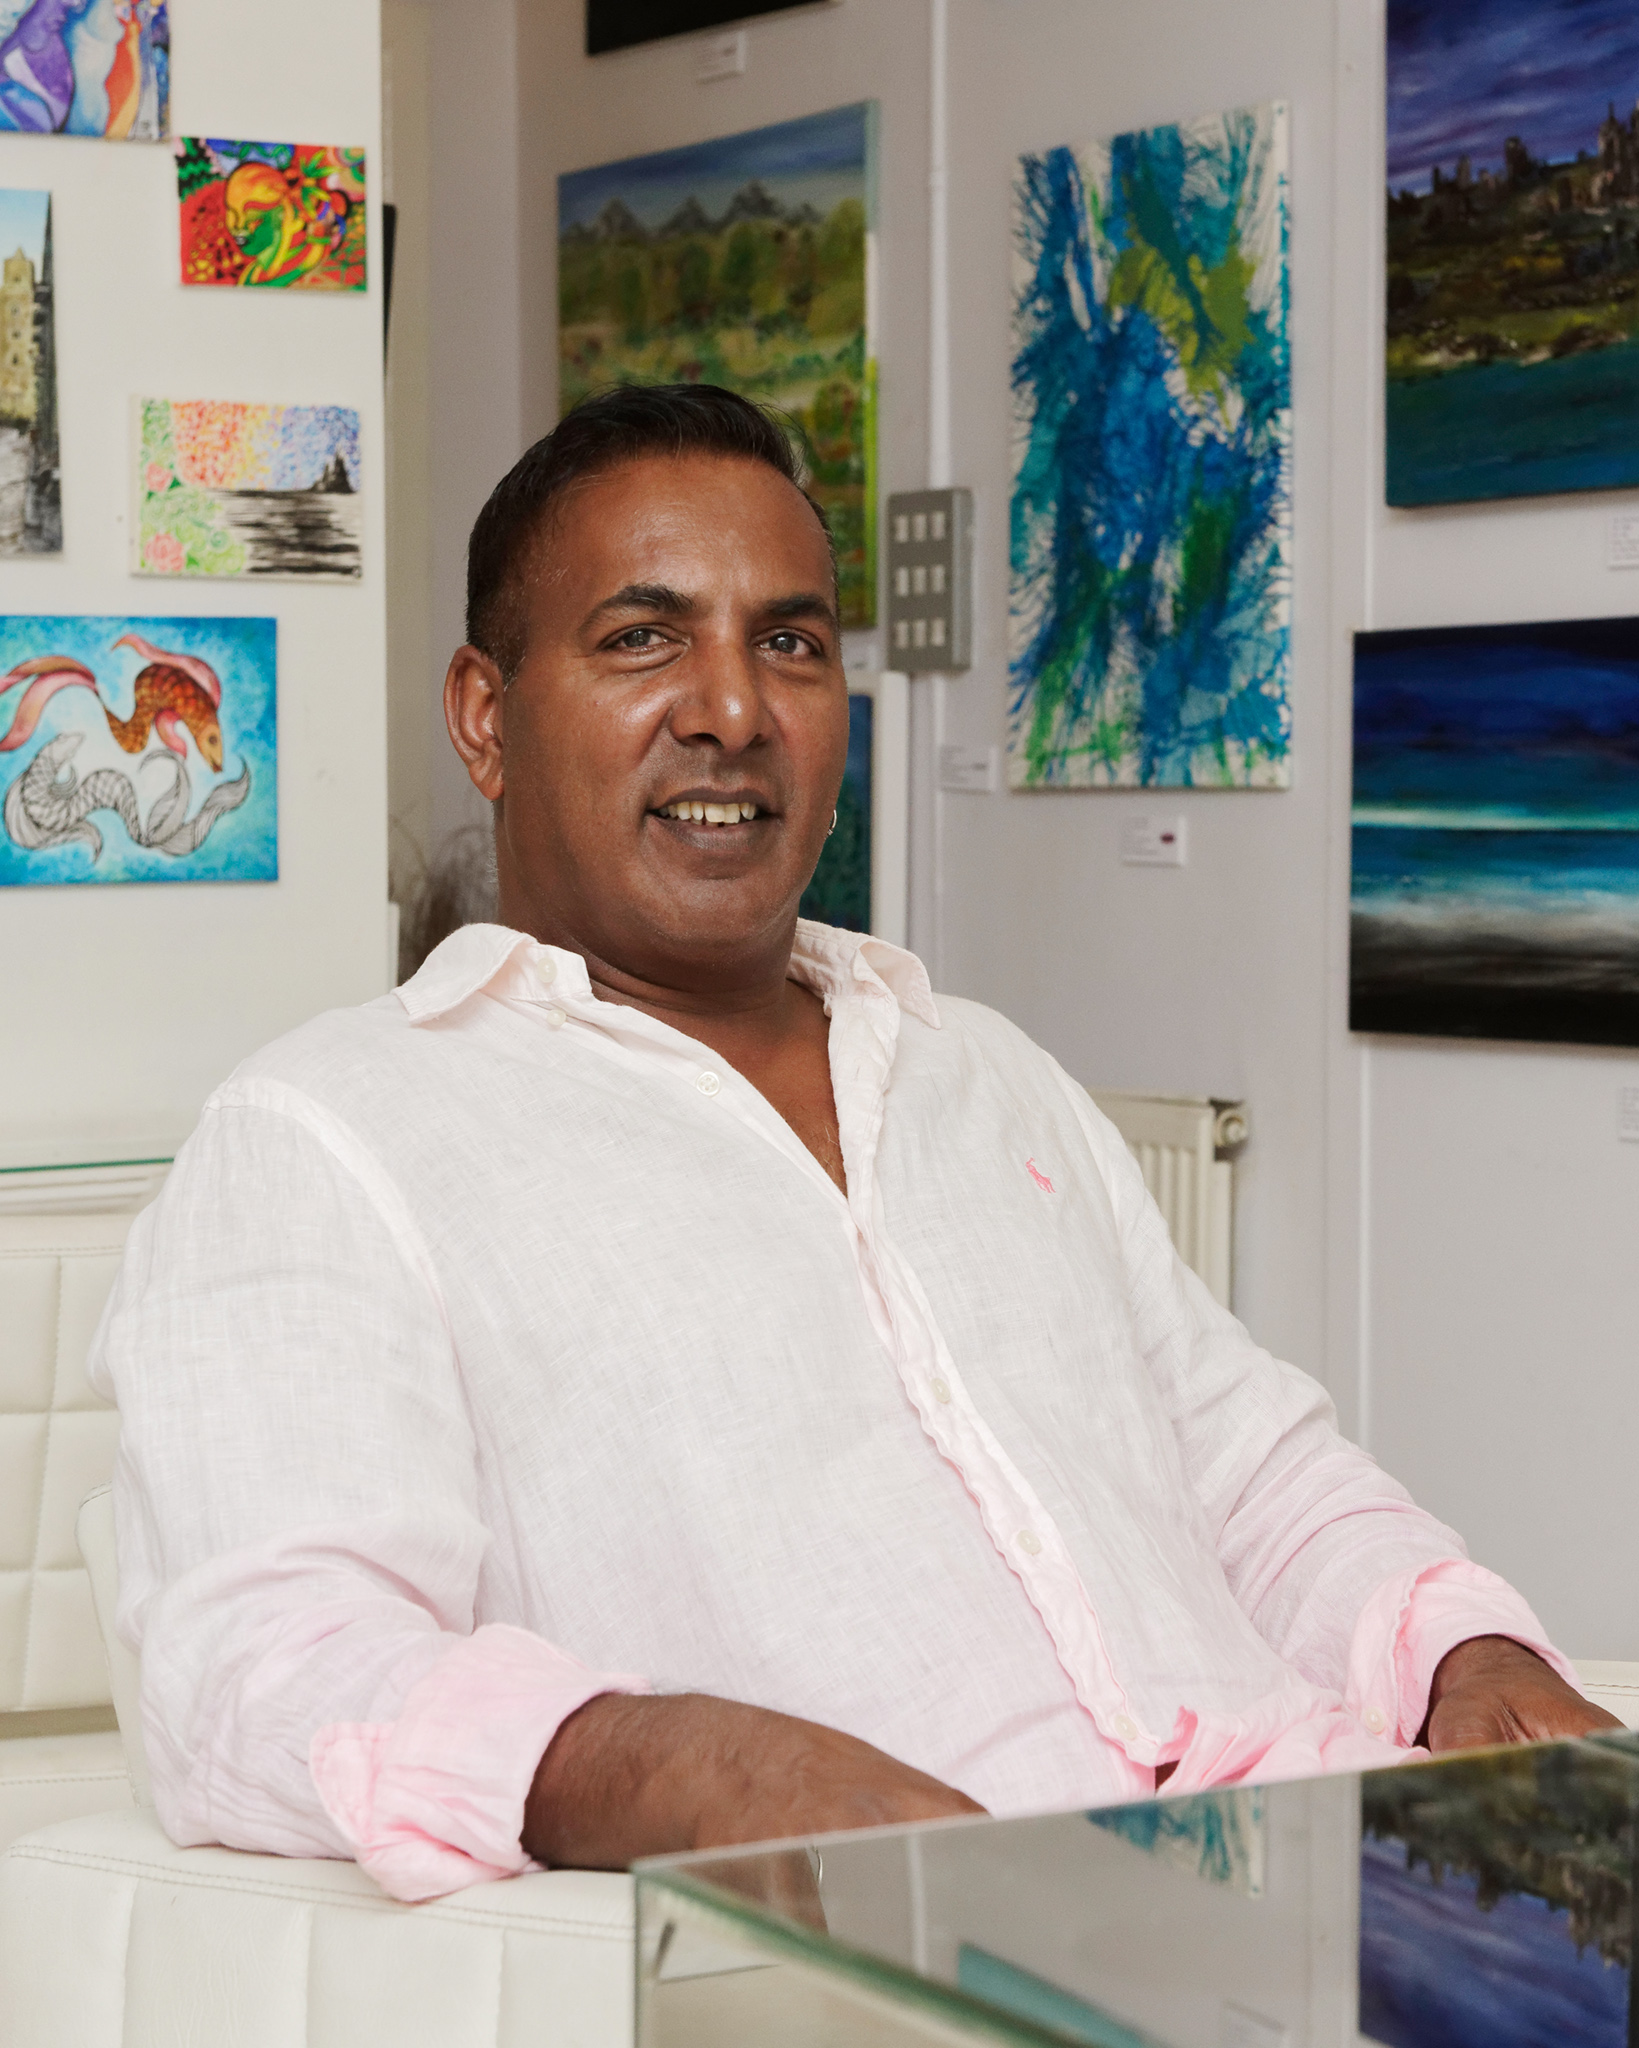 Kish Soobramaney at his desk - La Zaris